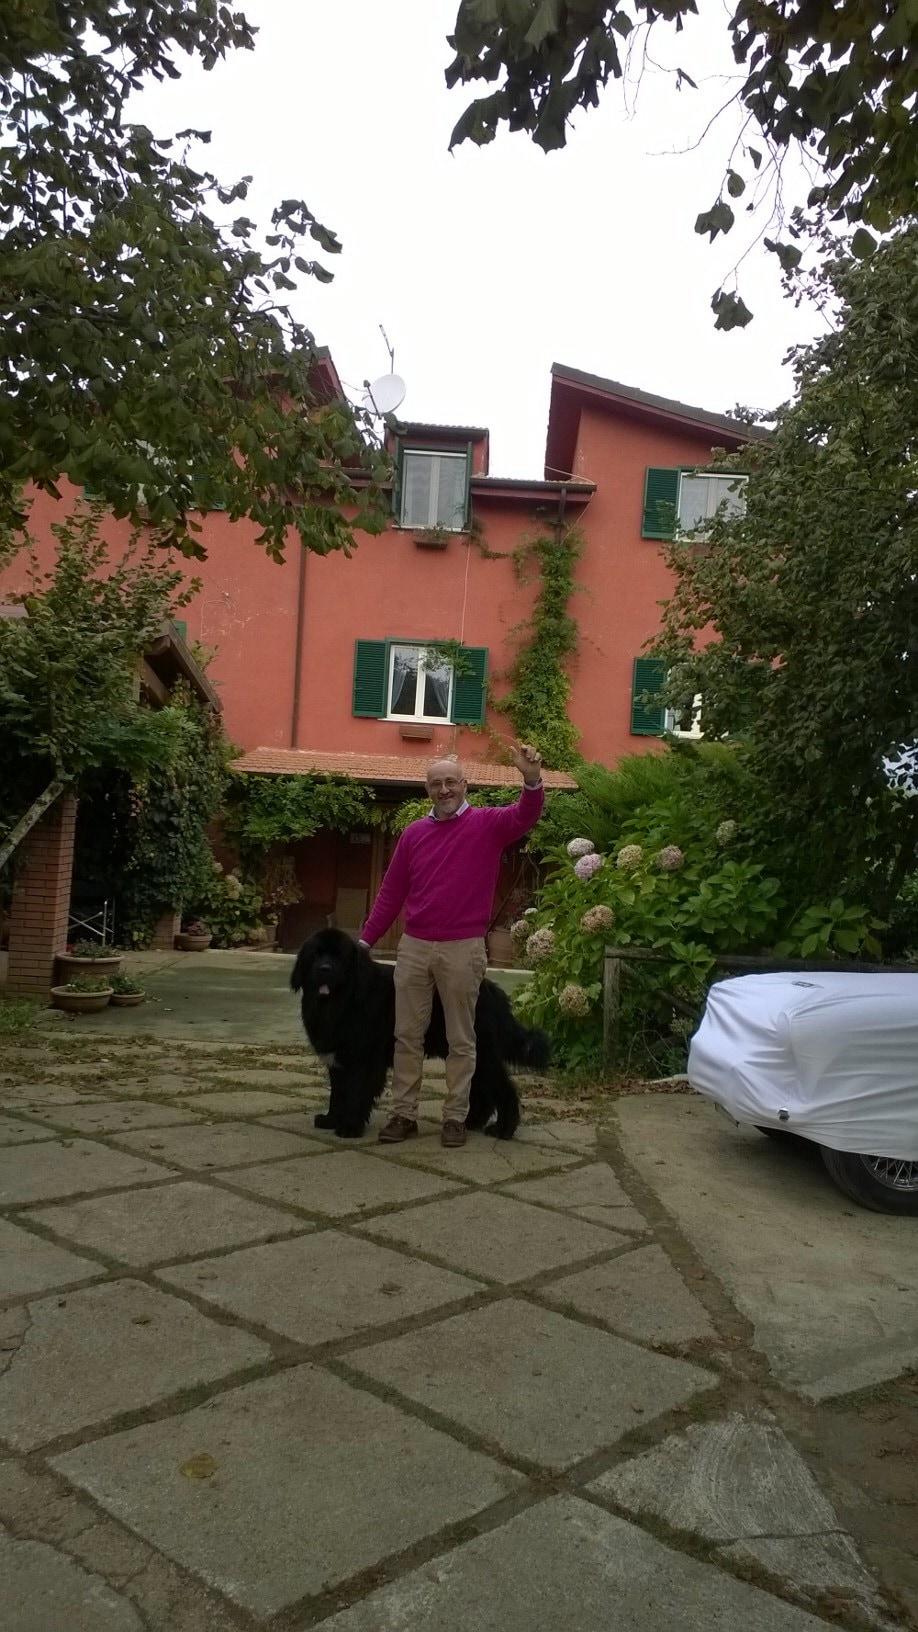 Arturo From Monterosi, Italy